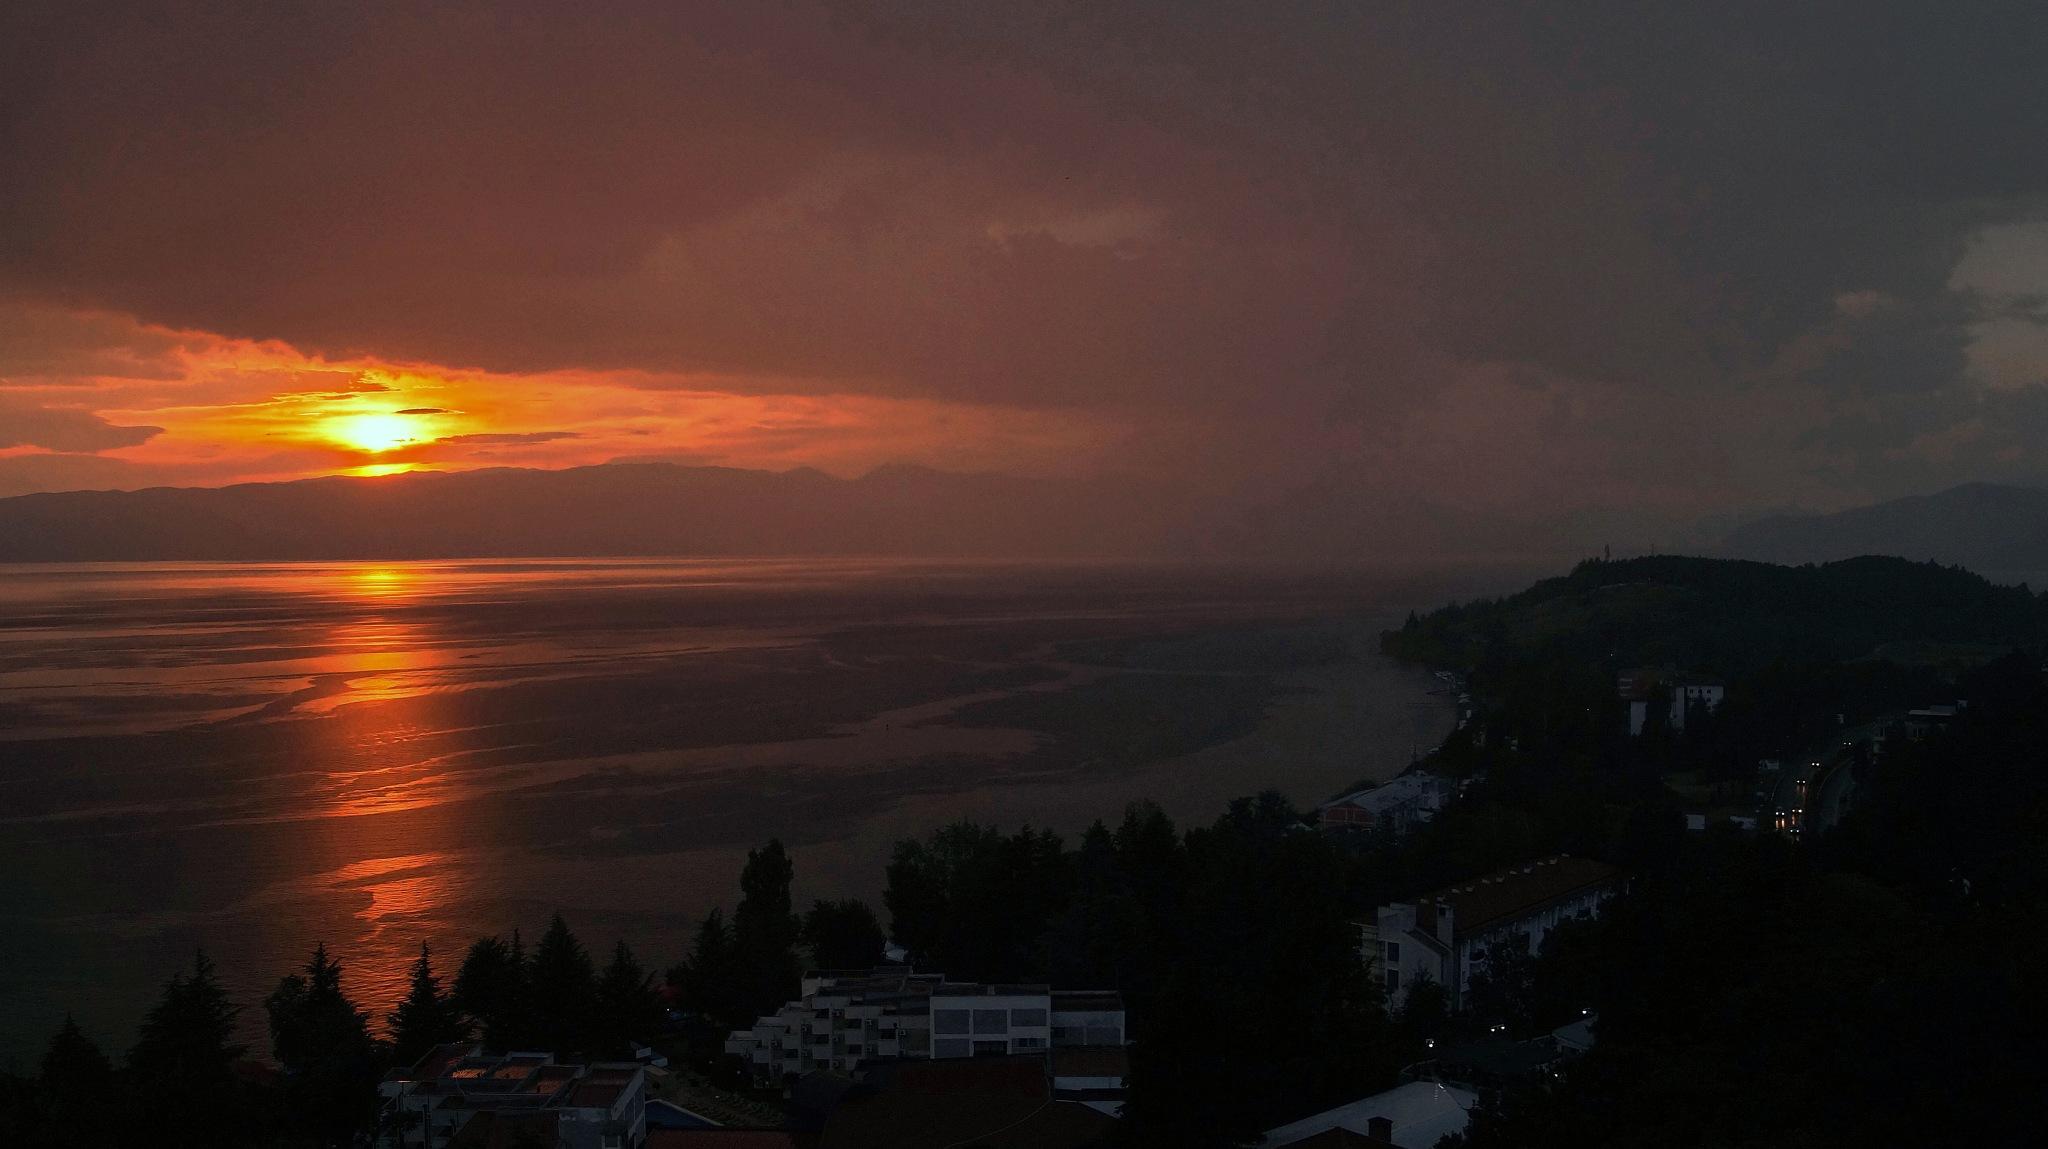 Sunset in Ohrid,Macedonia by darko1965